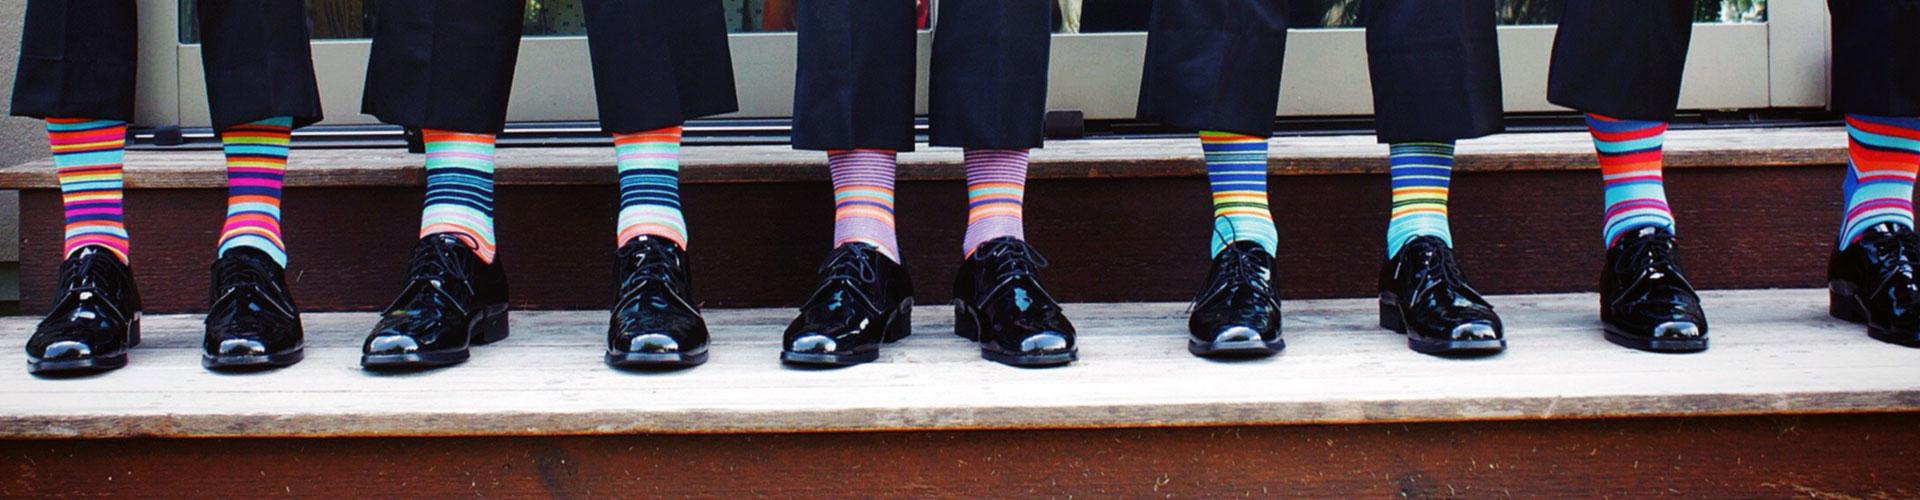 Tio tips - Tio färgglada fötter